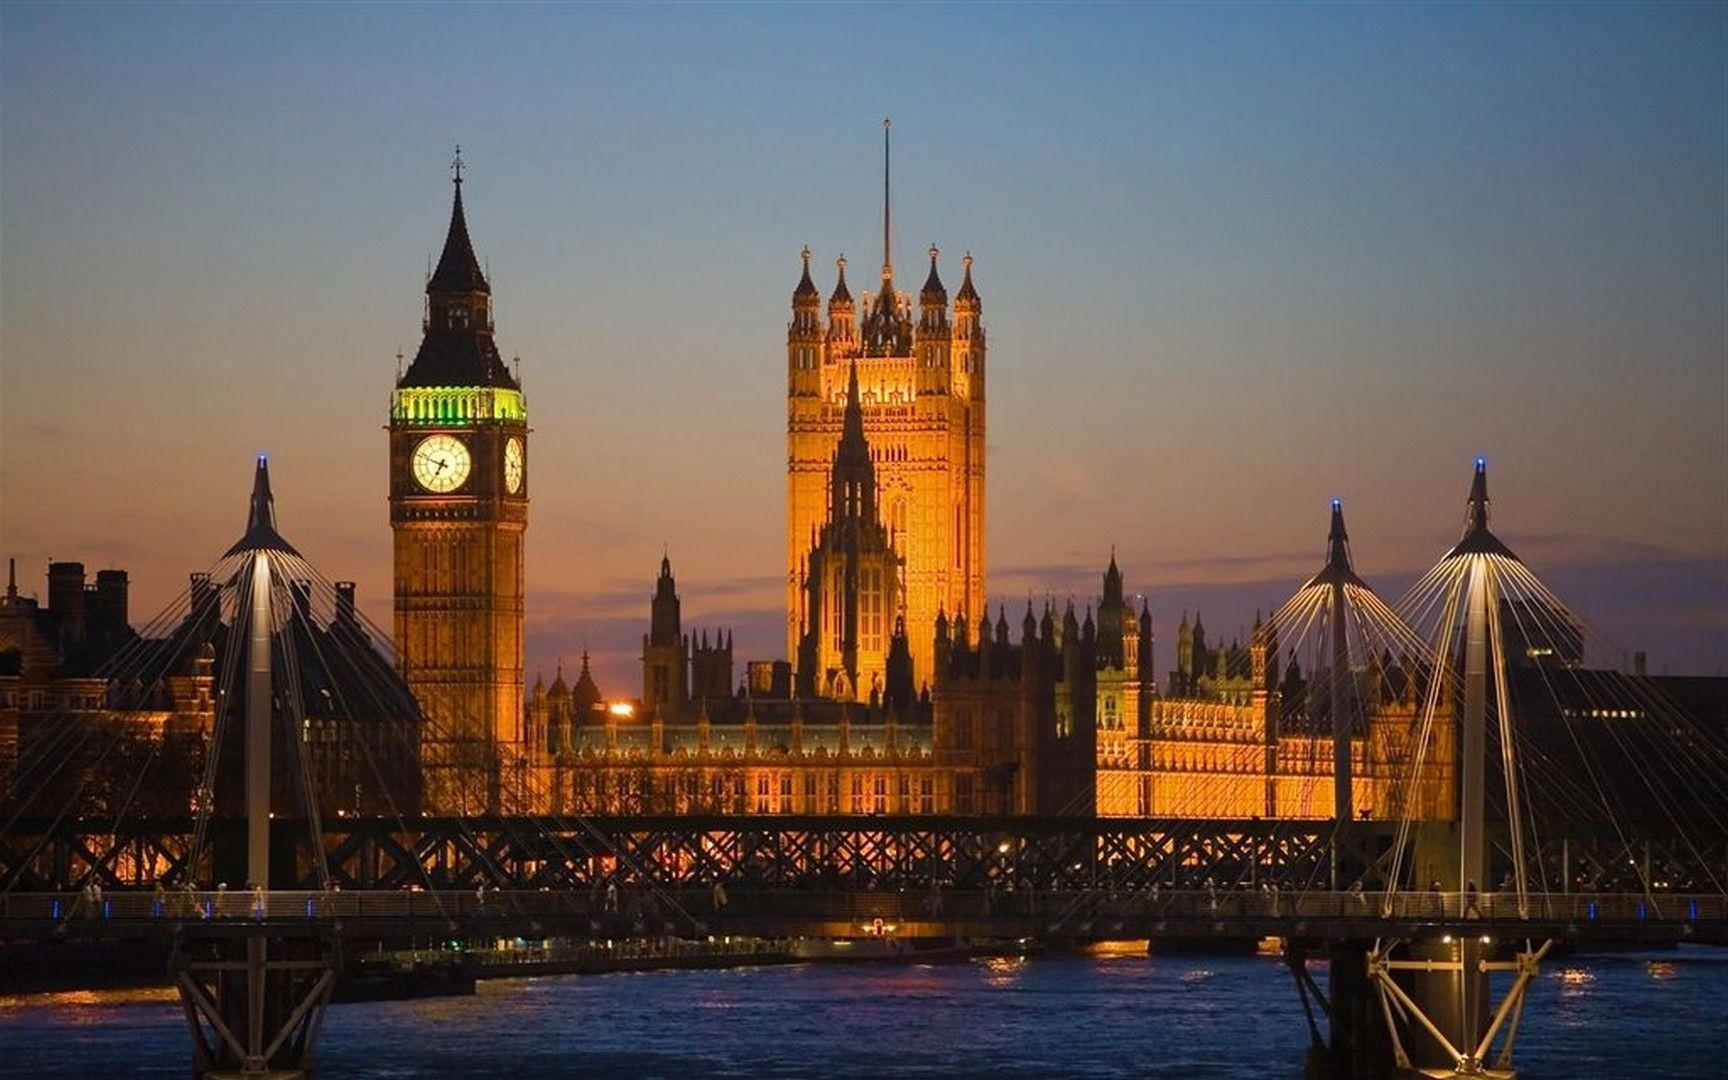 london wallpaper wallpaperwallpapersfree - photo #16